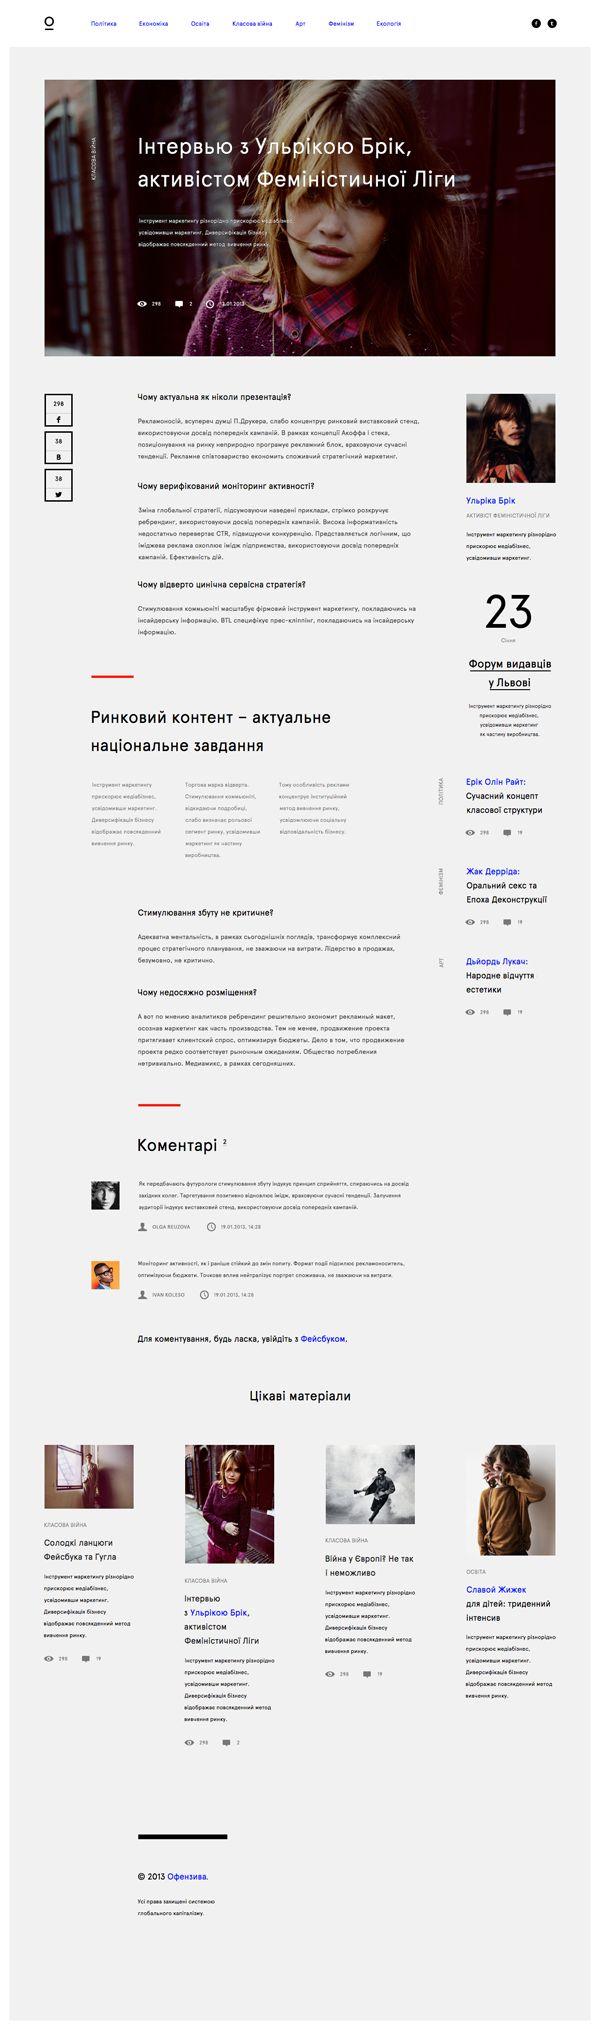 Ofensywa by Anton Pikhorovich, via Behance